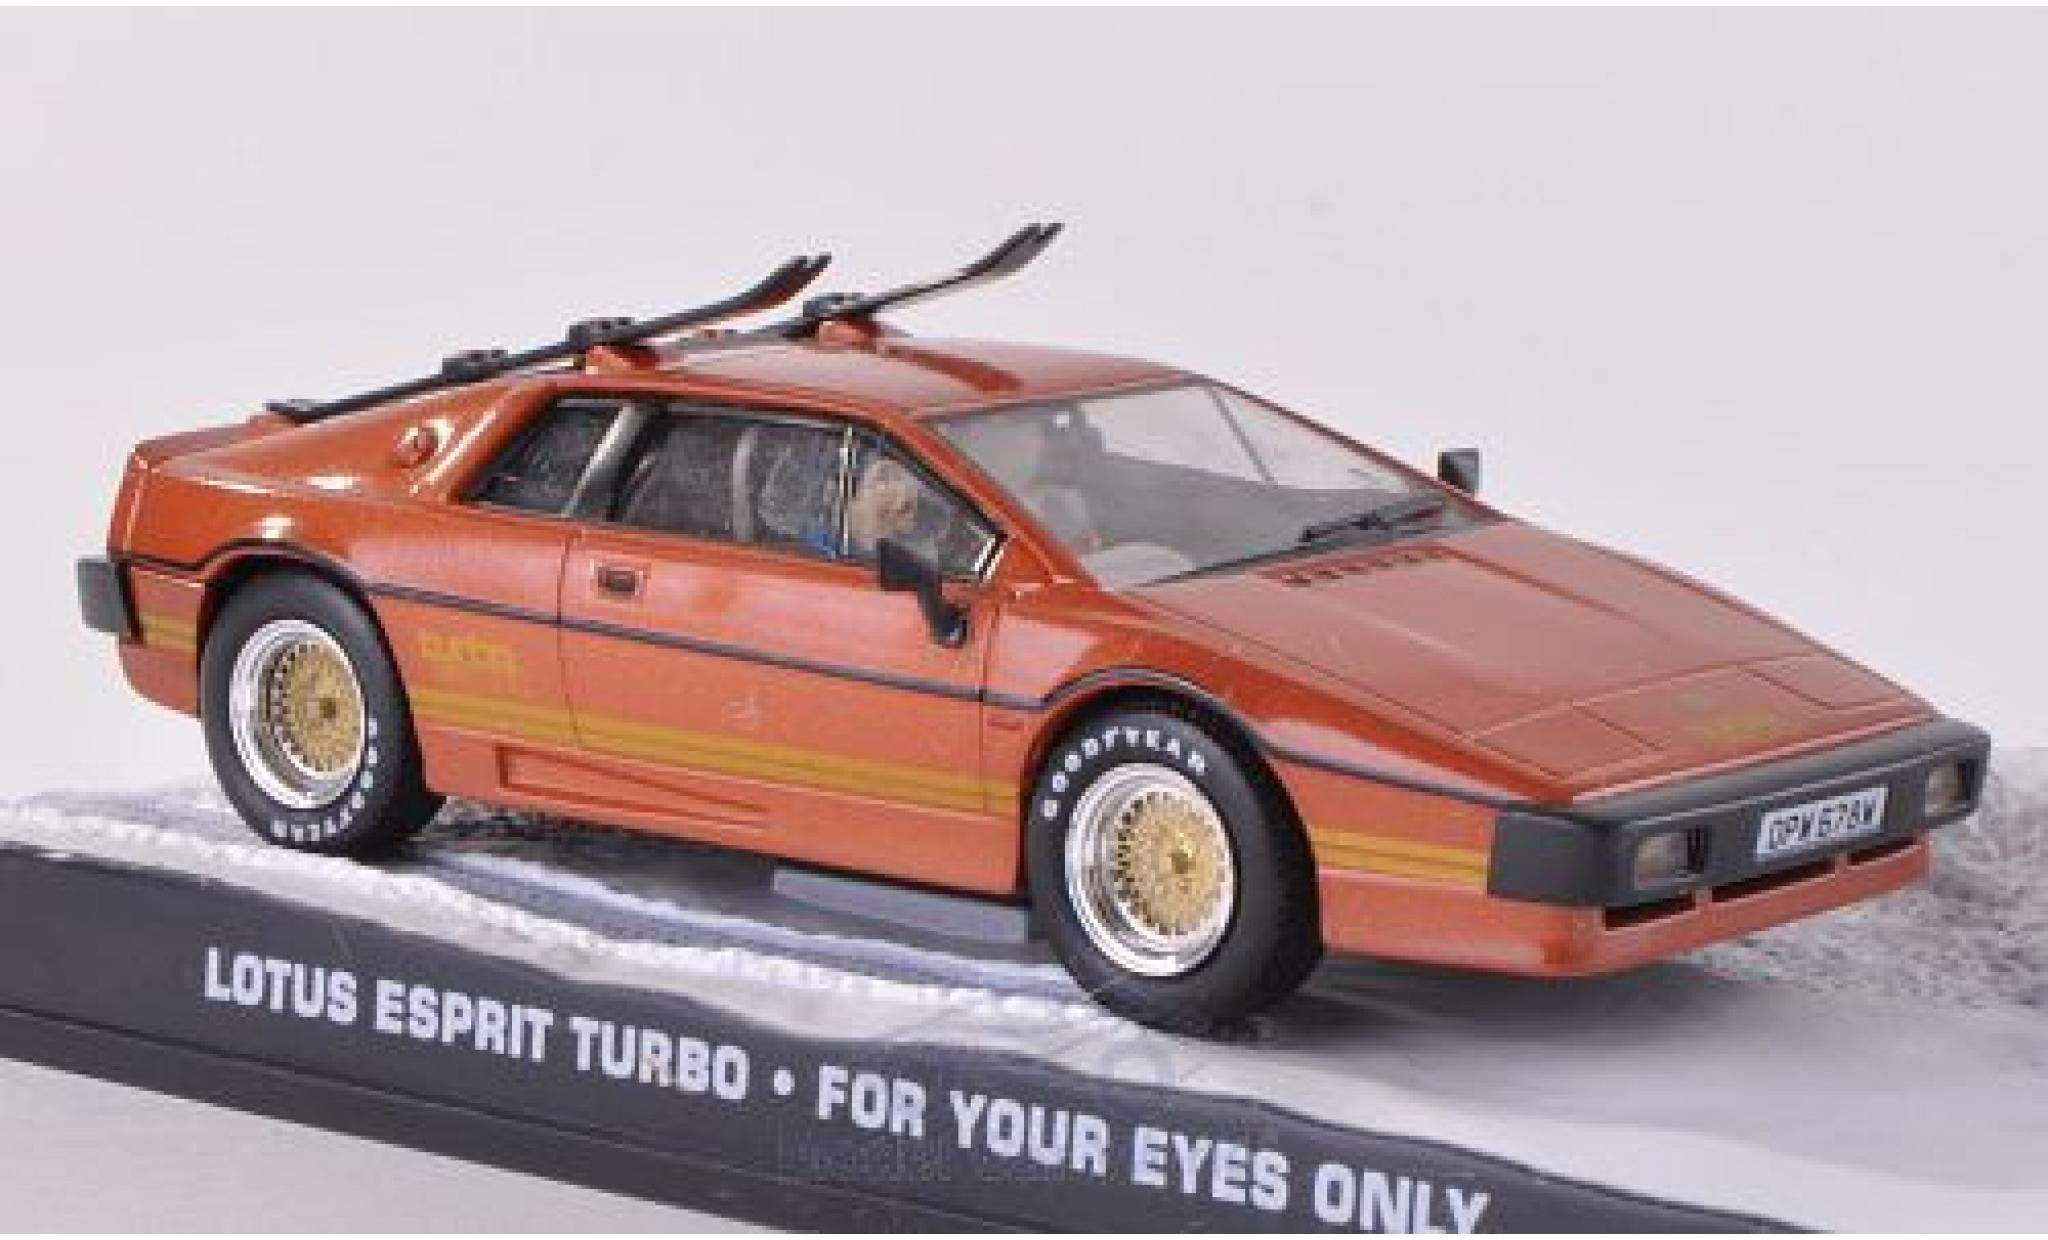 Lotus Esprit 1/43 SpecialC 007 Turbo kupfer James Bond 007 For Your Eyes Only ohne Vitrine